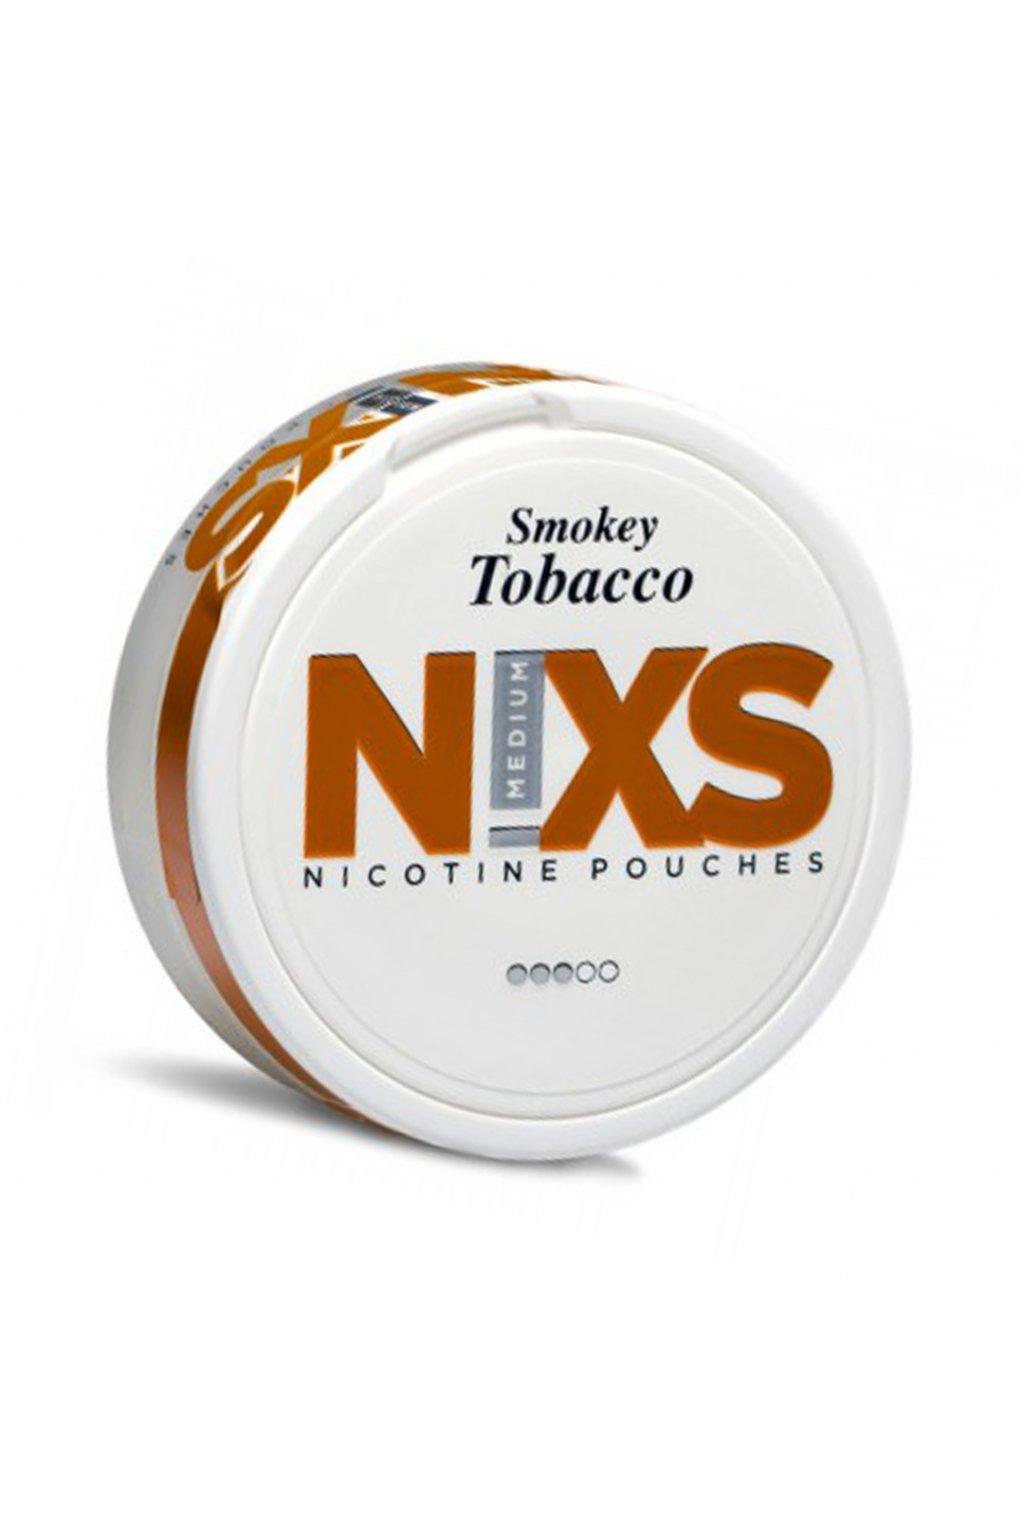 nixs smokey tobacco nikotinove sacky nicopods